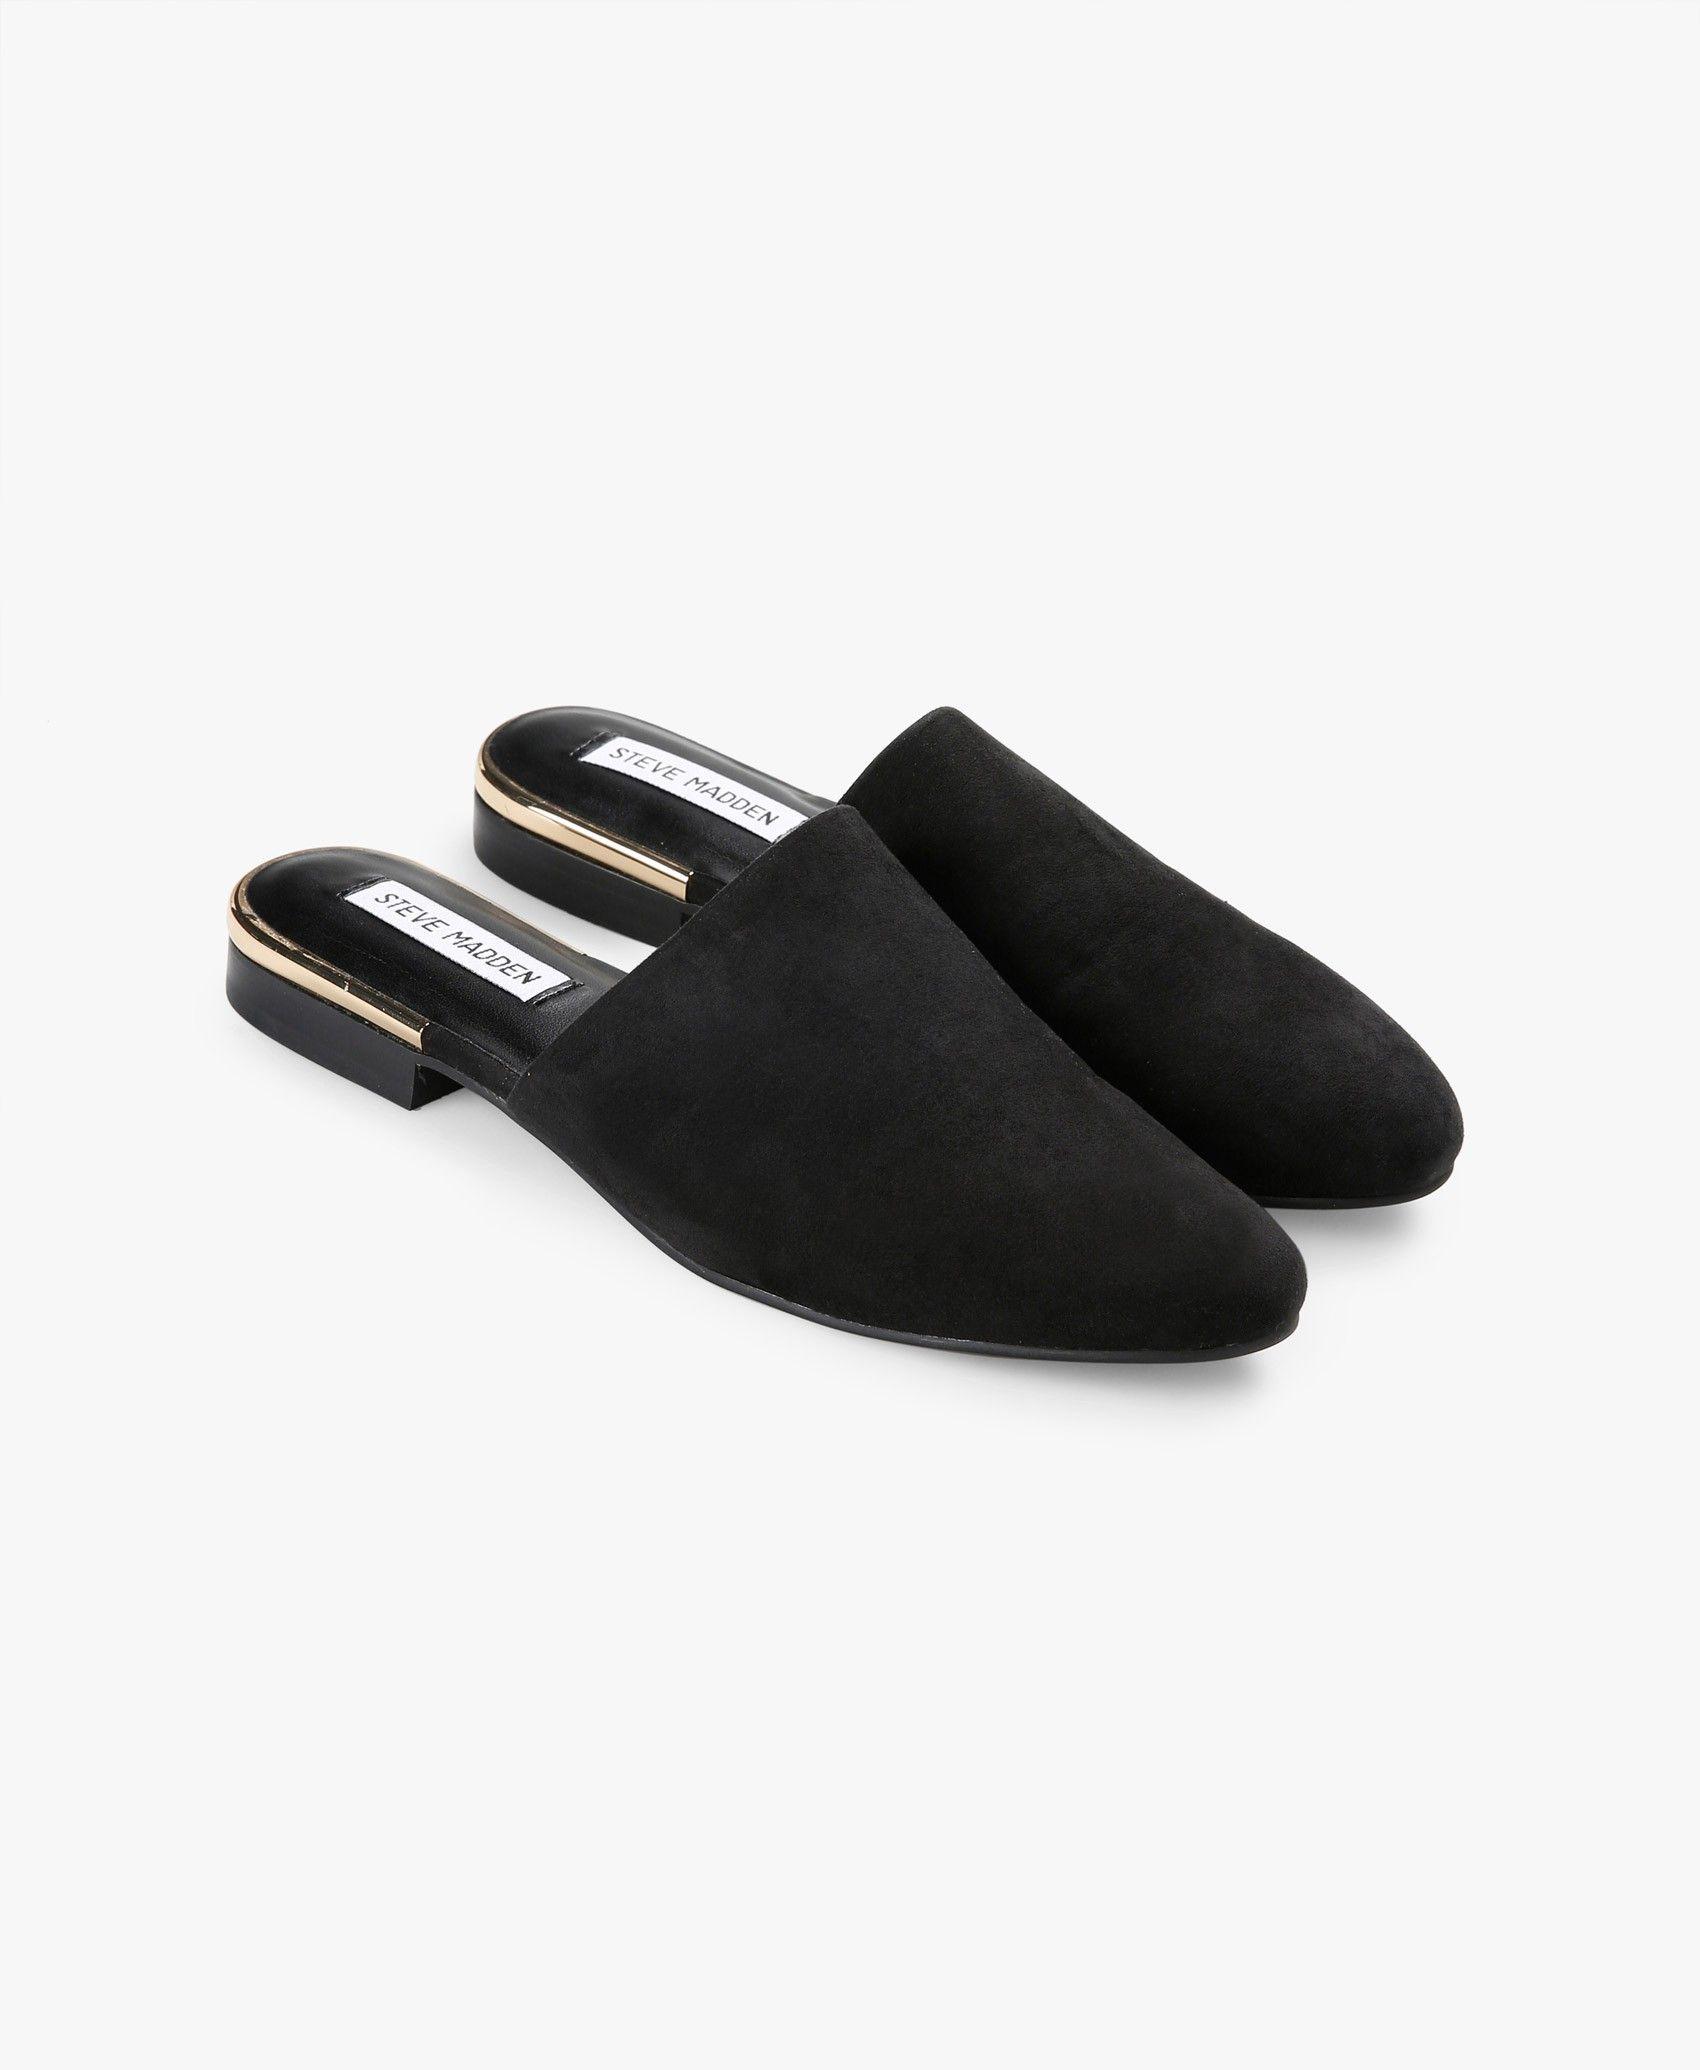 cb61c84edb6f45 COM Balenciaga Shoes